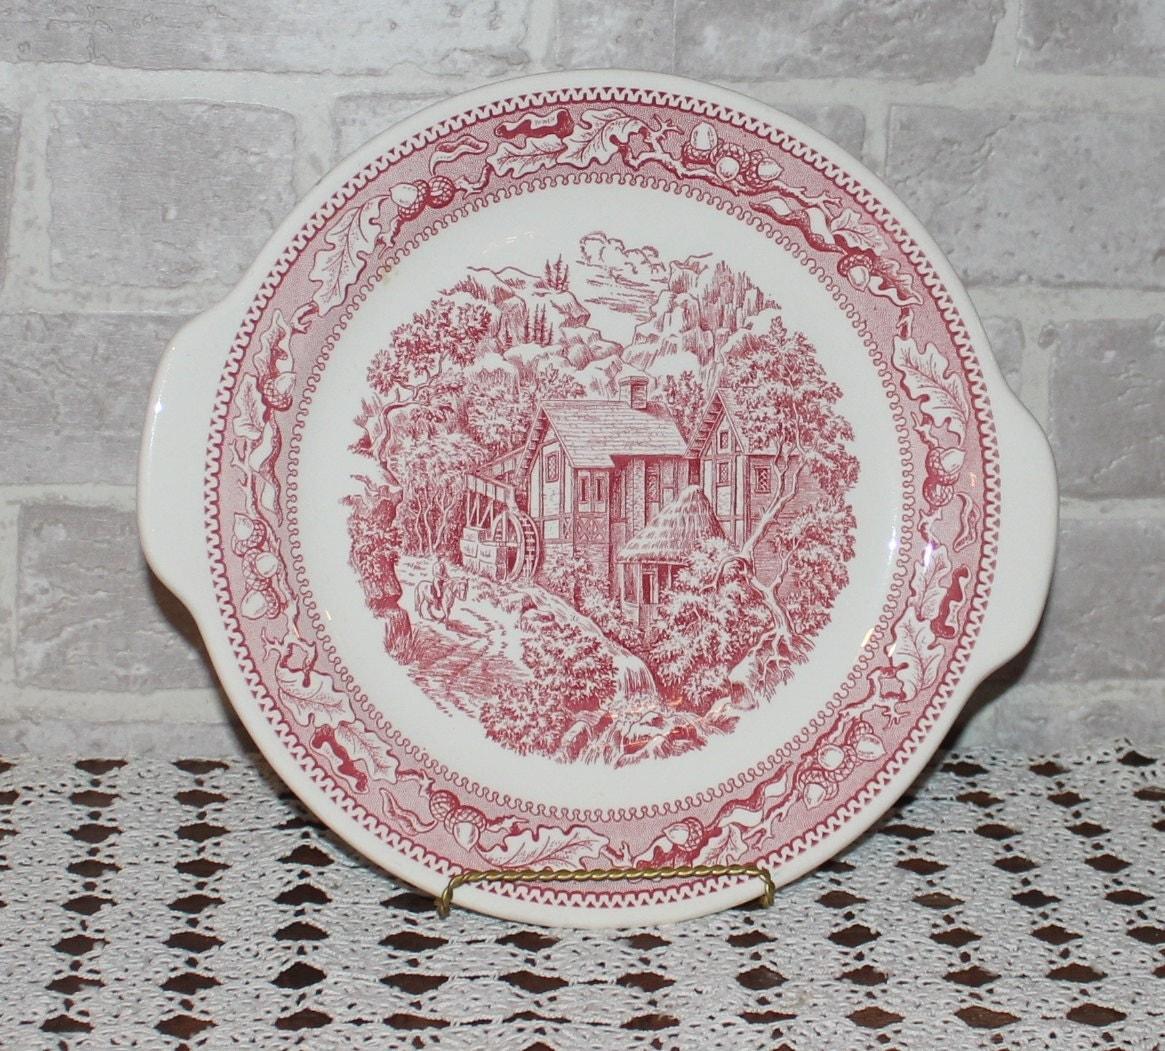 Memory Lane Platter Handled Cake Plate Red Transferware